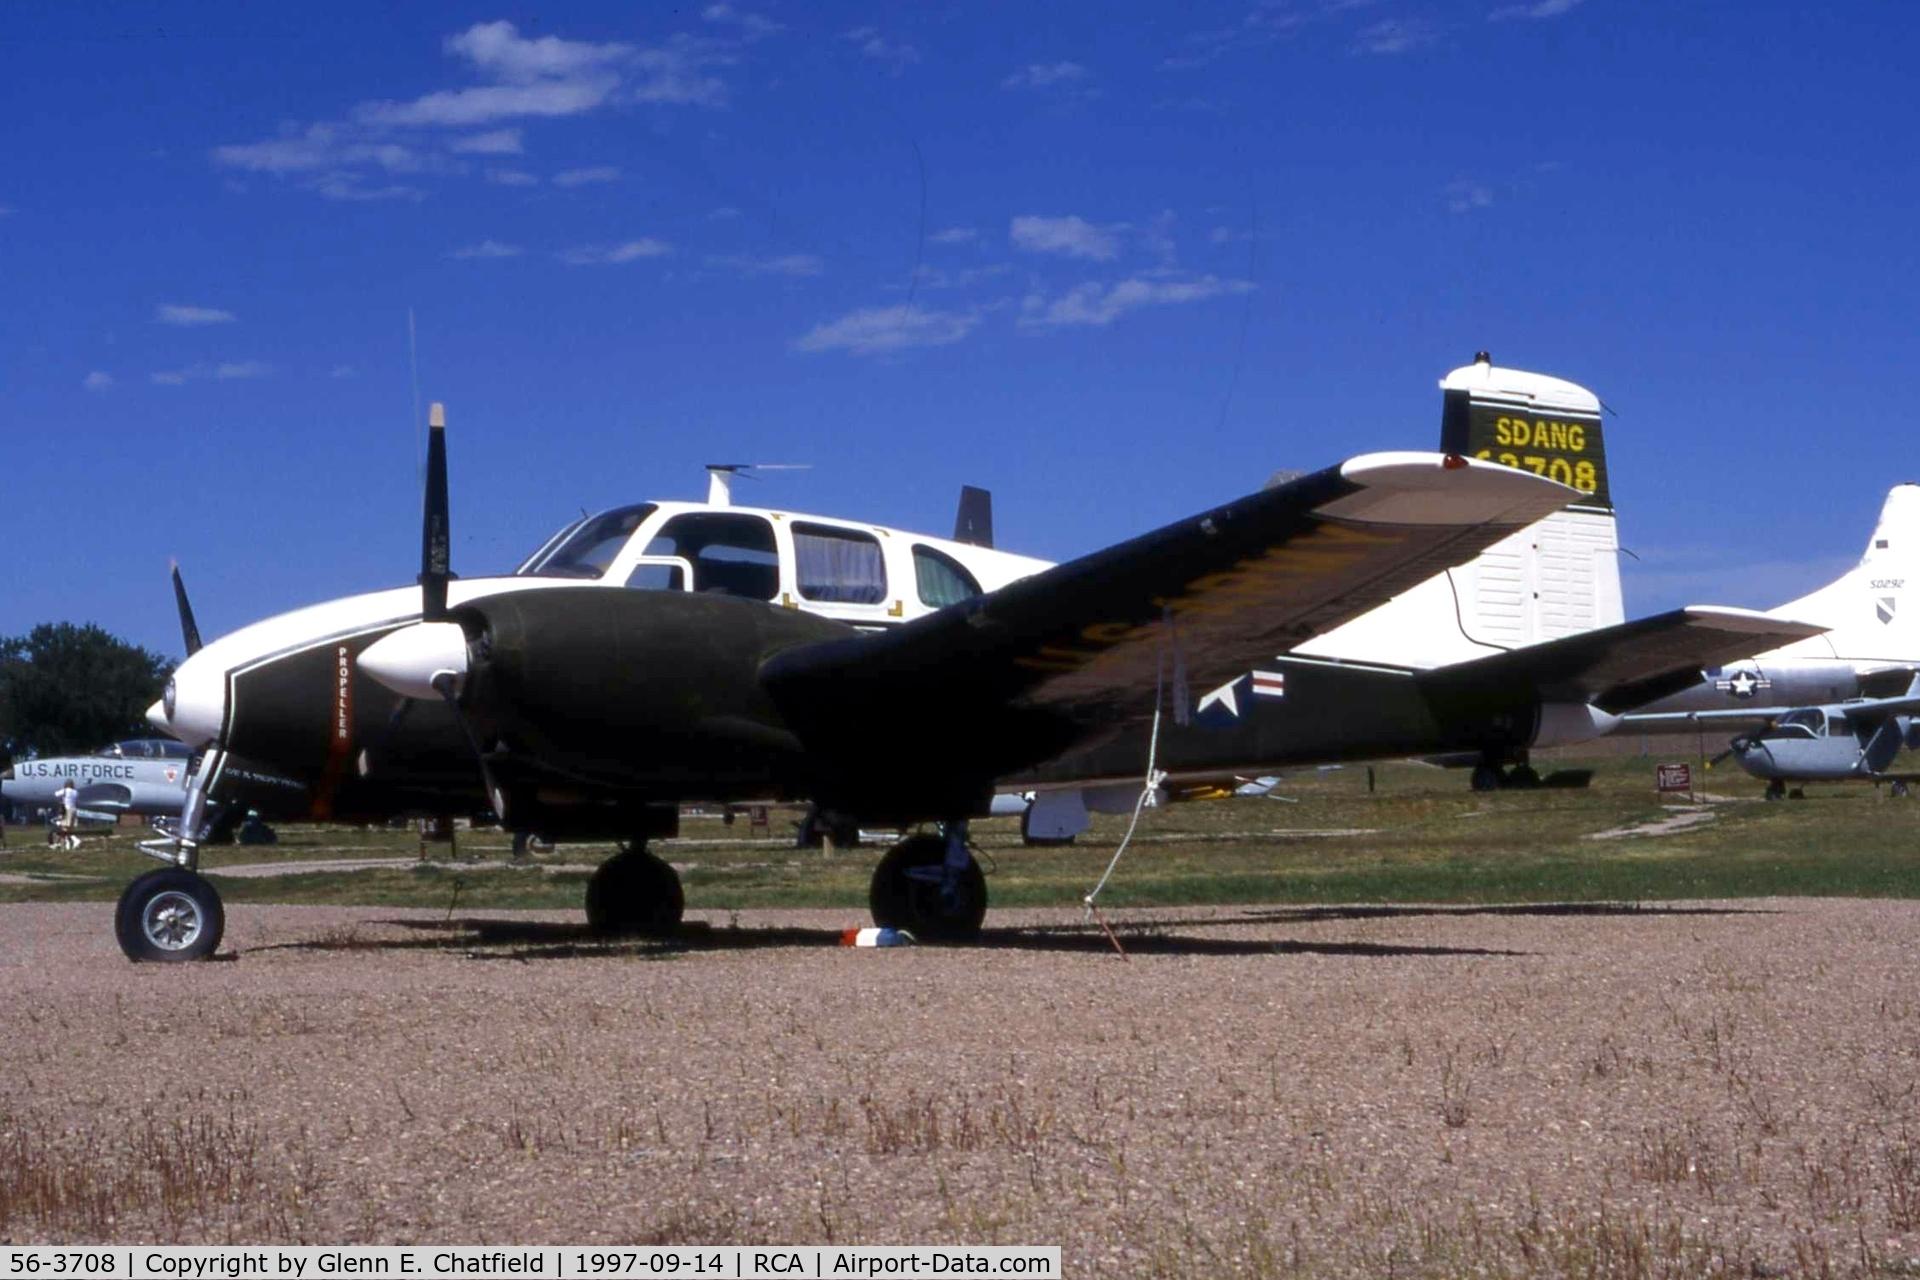 56-3708, 1957 Beechcraft L-23D C/N 109, U-8D at the South Dakota Air & Space Museum